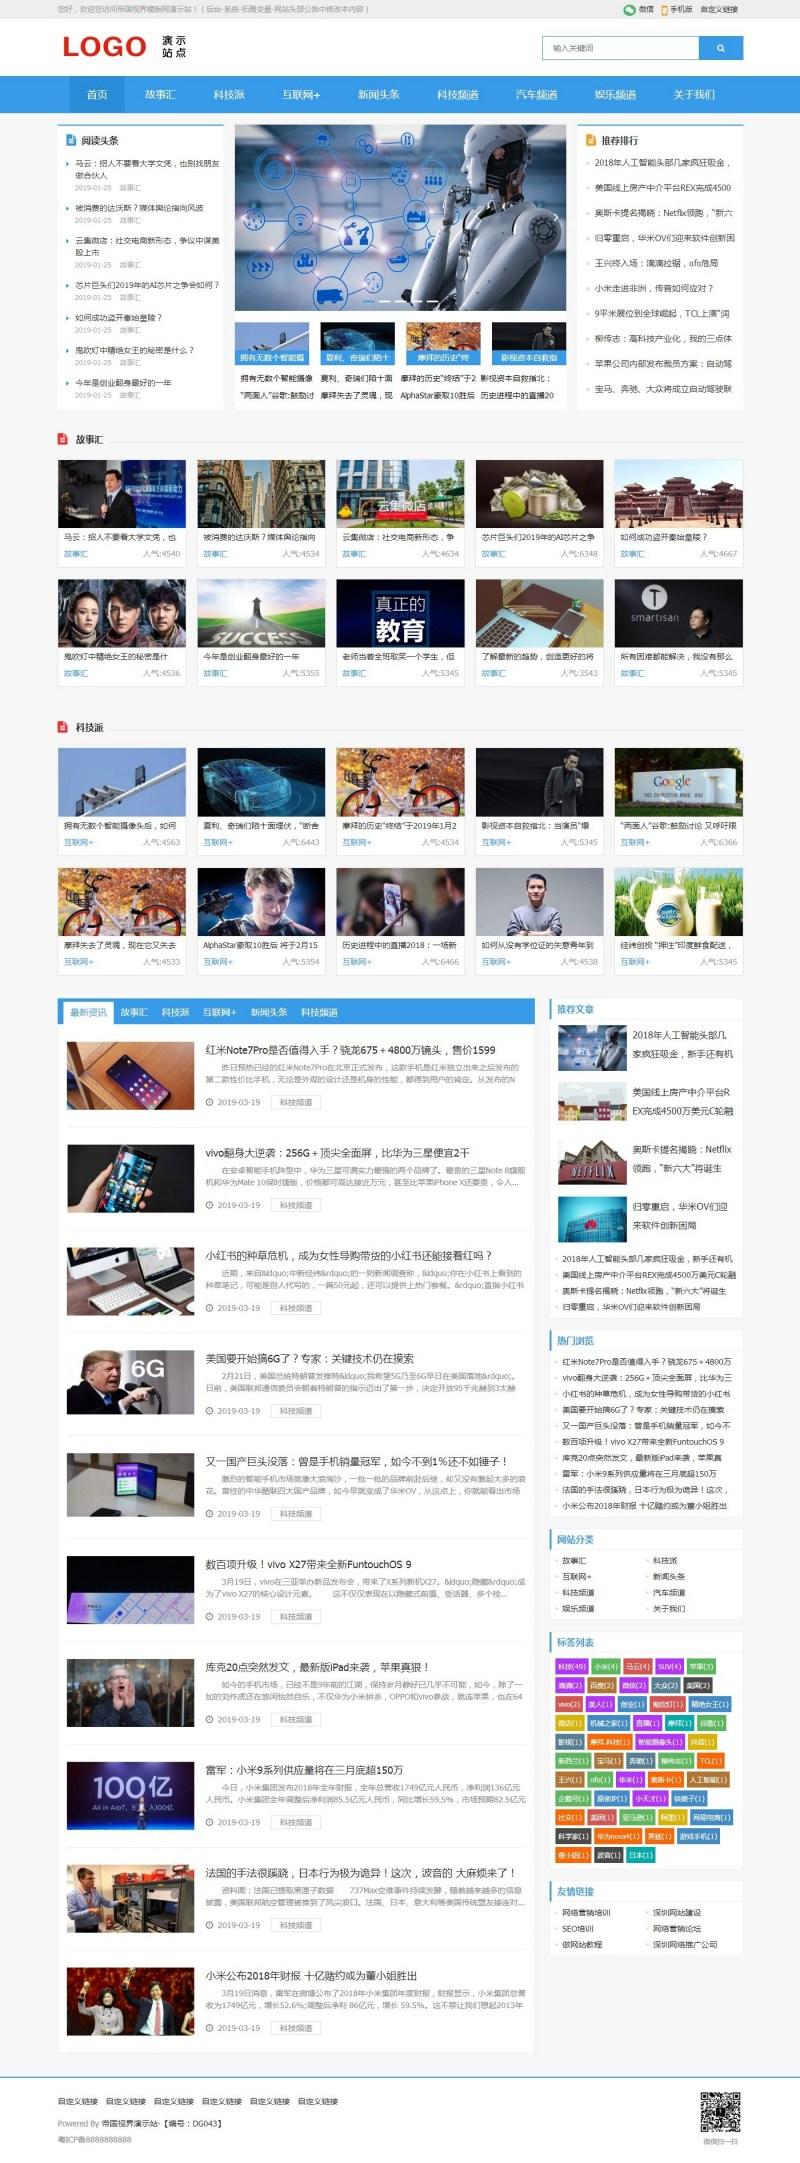 [DG-043]帝国cms蓝色新闻资讯博客模板自适应手机 新闻资讯